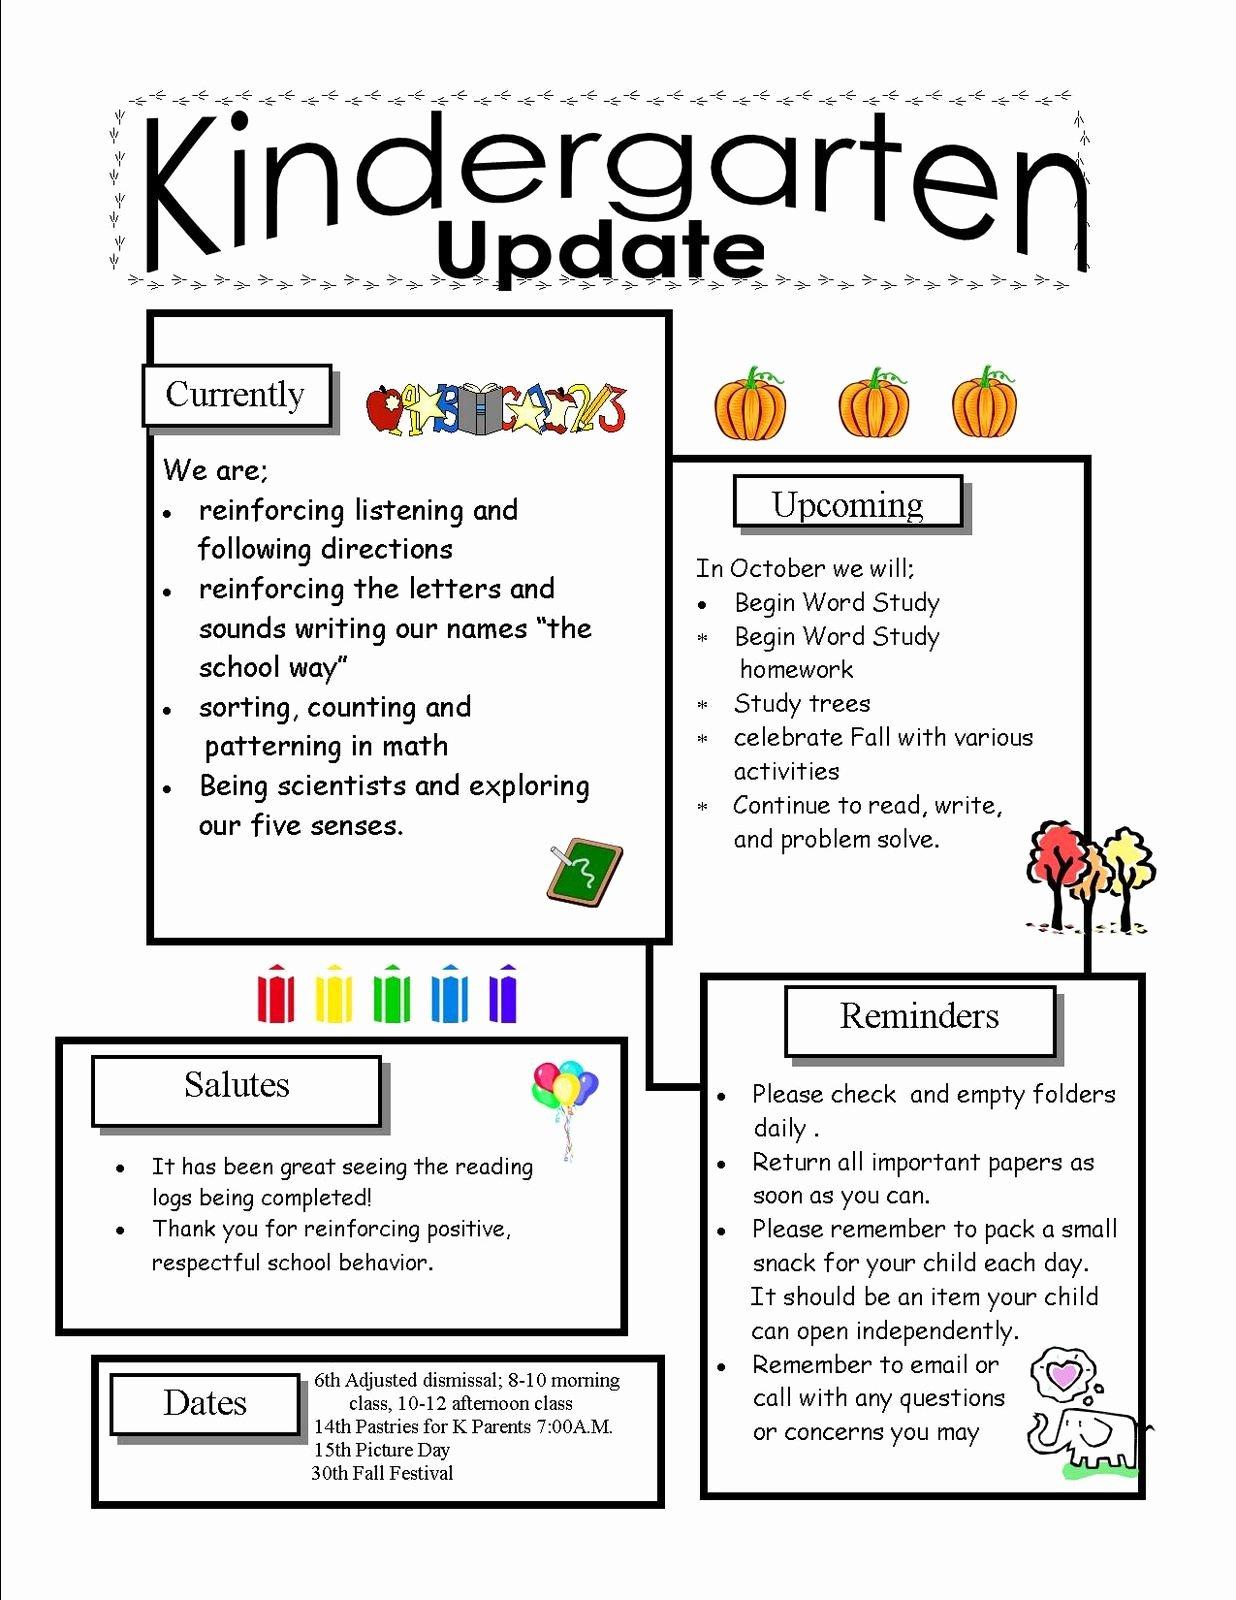 Free Newsletter Templates for Preschool Inspirational Kindergarten Newsletter Templates for Free